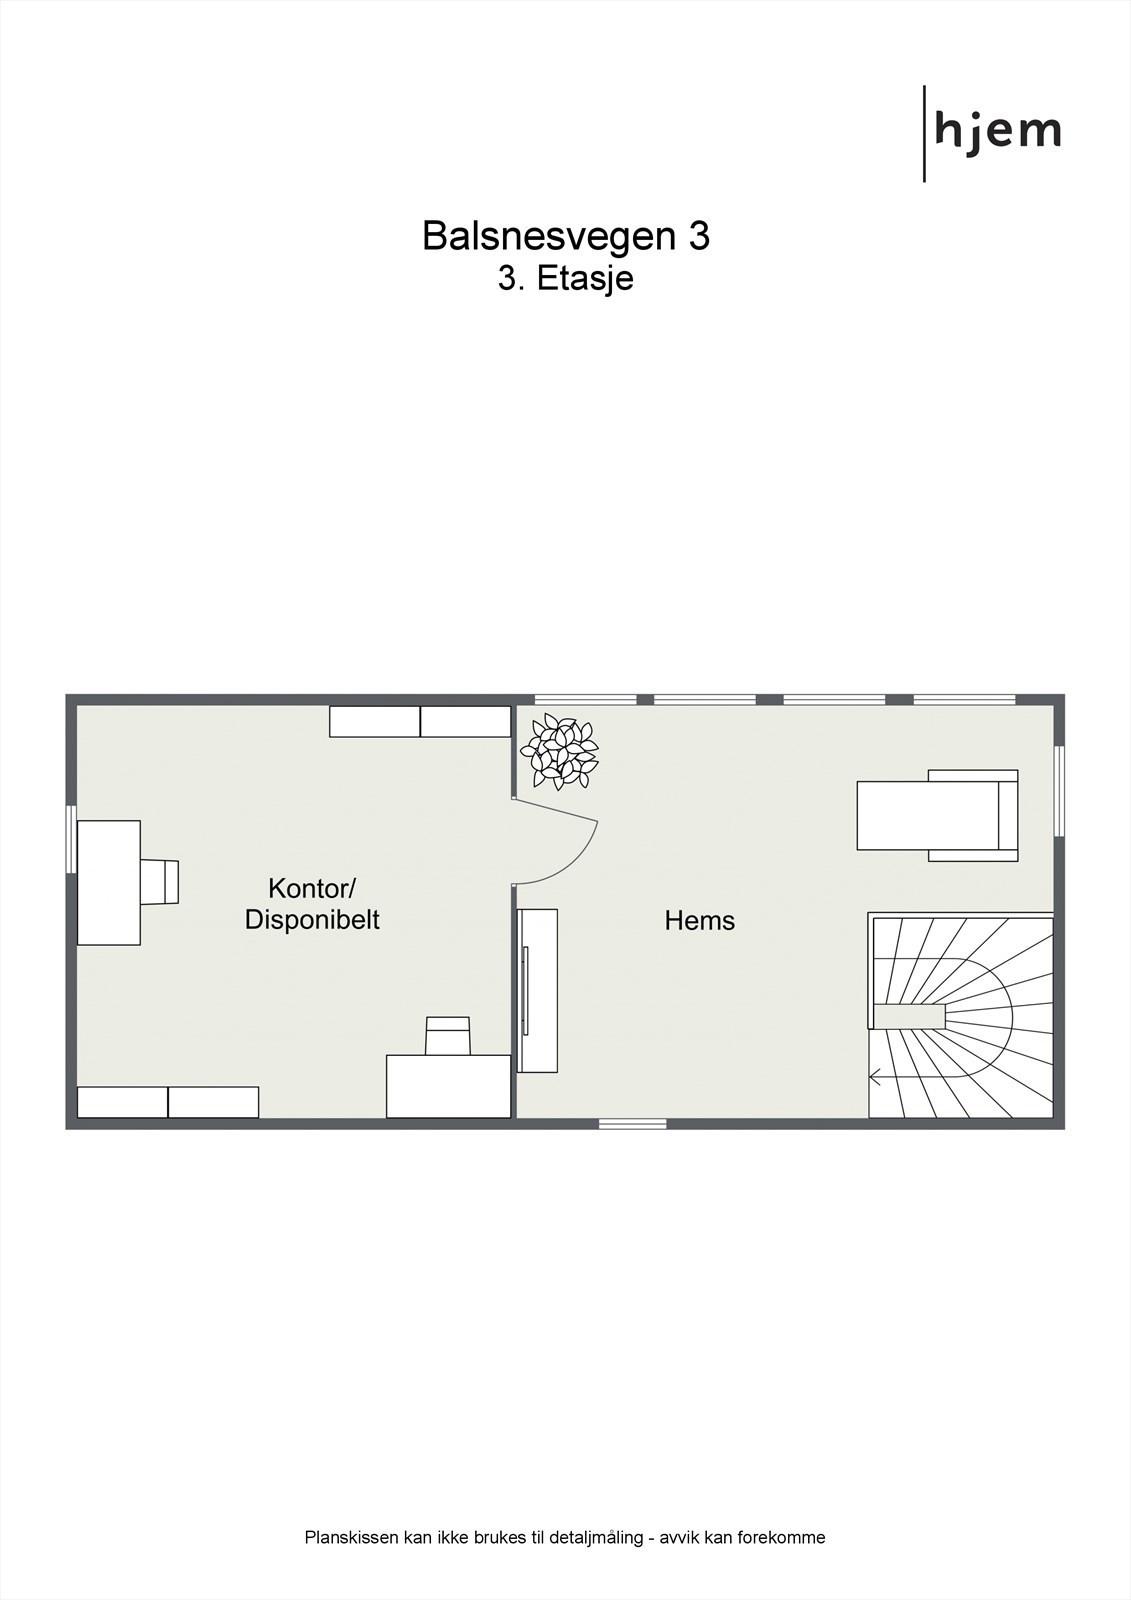 Floorplan letterhead - Balsnesvegen 3 - 3. Etasje - 2D Floor Plan.jpg